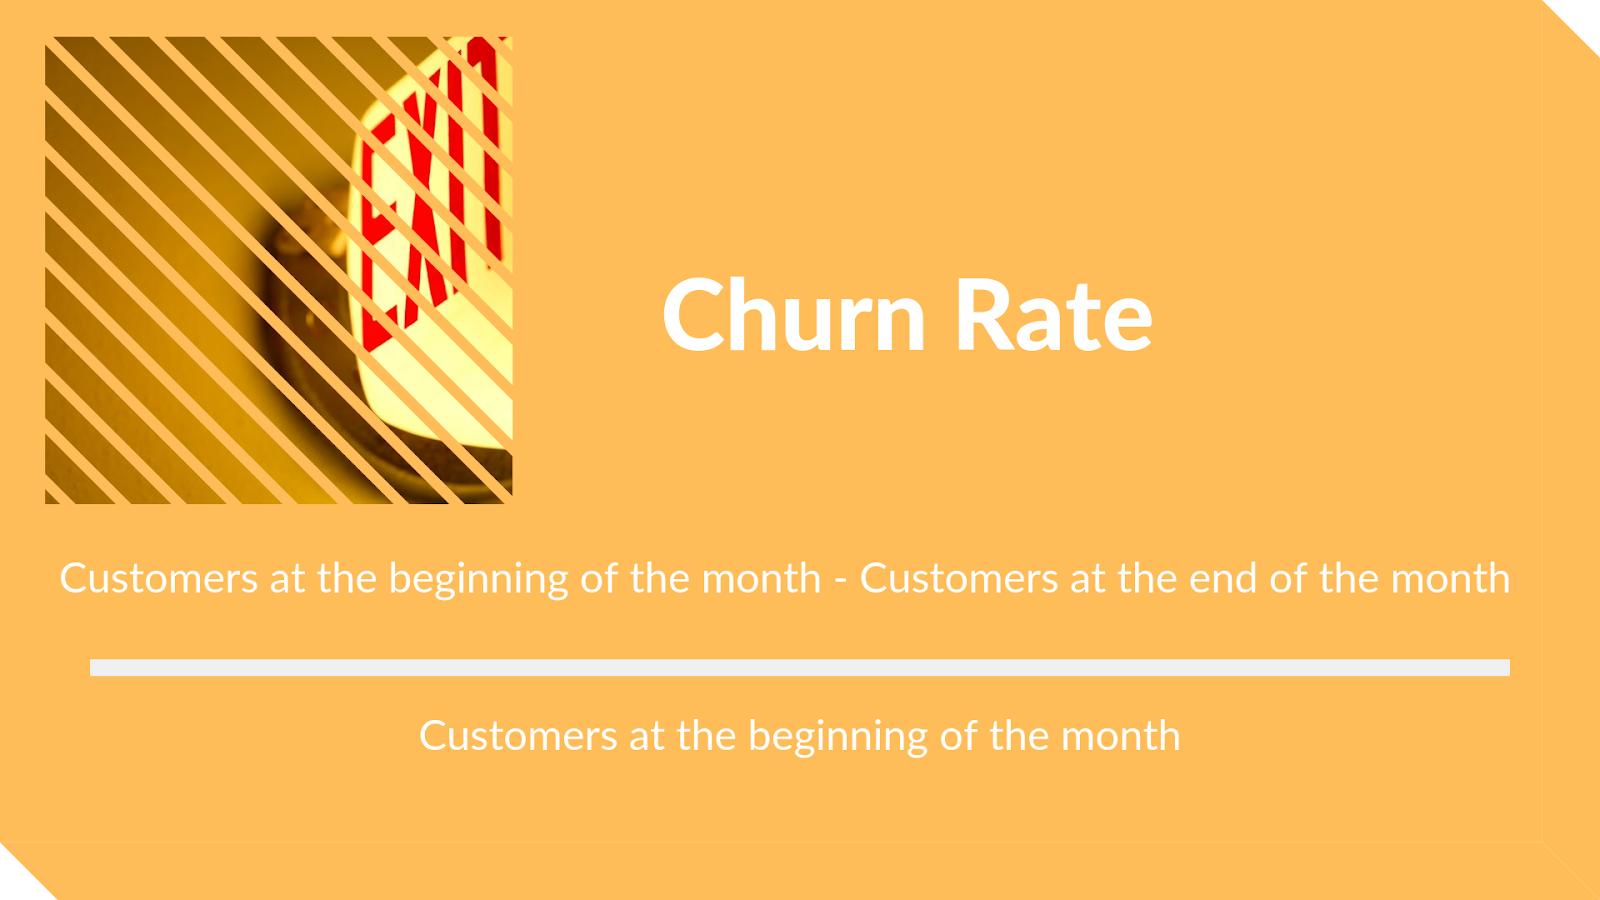 Churn - loyalty metrics